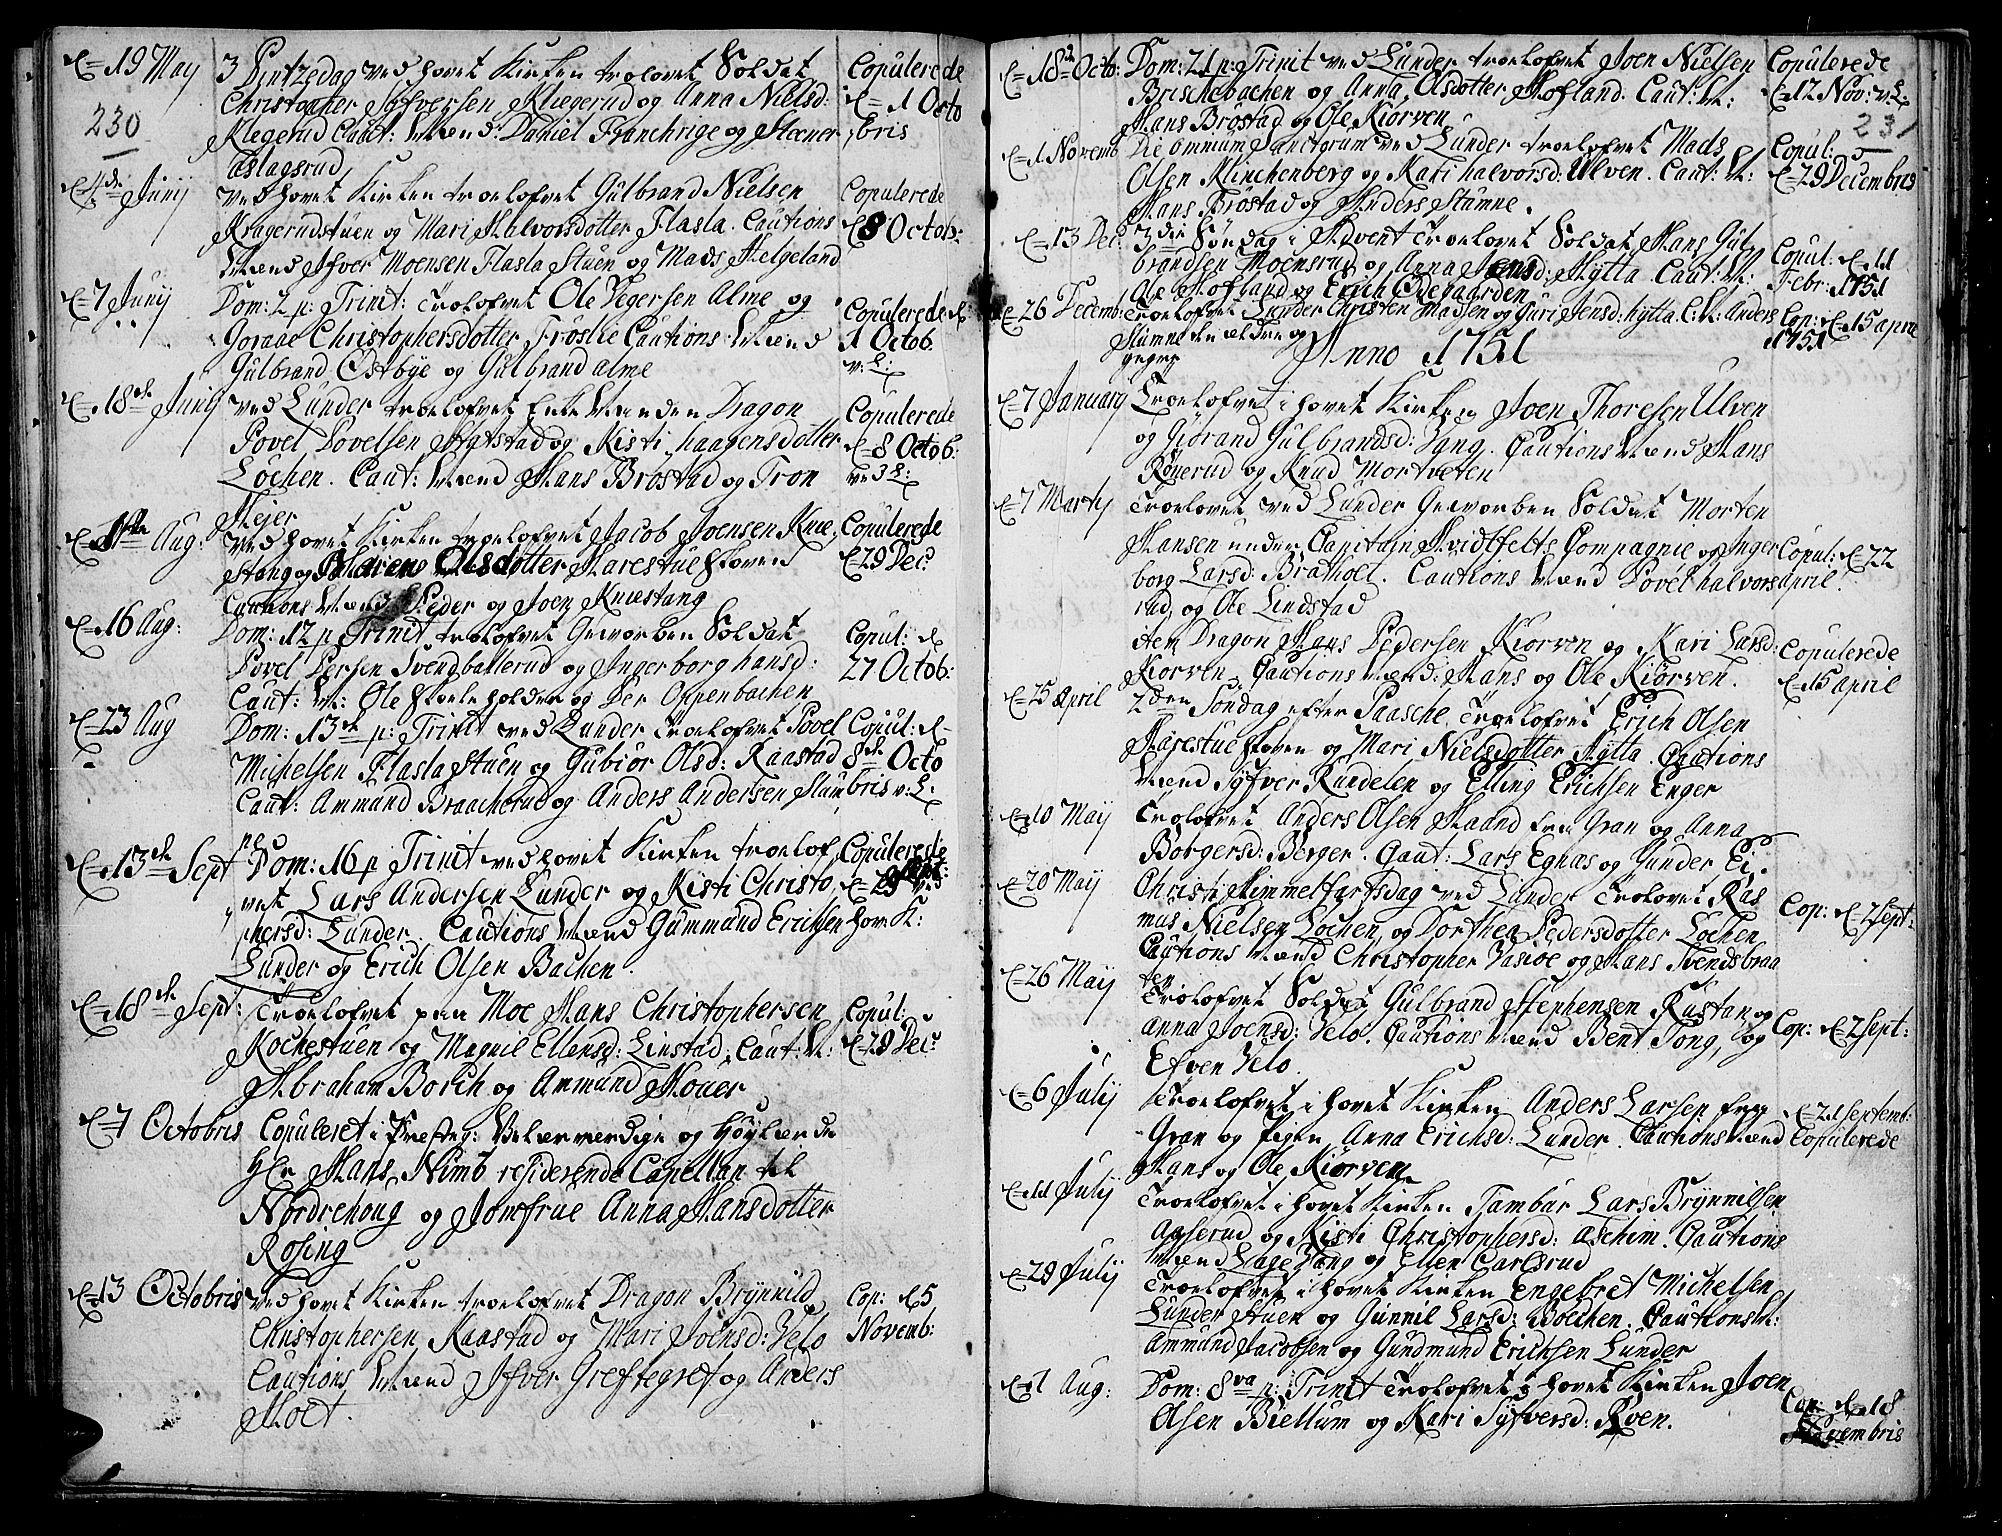 SAH, Jevnaker prestekontor, Ministerialbok nr. 2, 1725-1751, s. 230-231